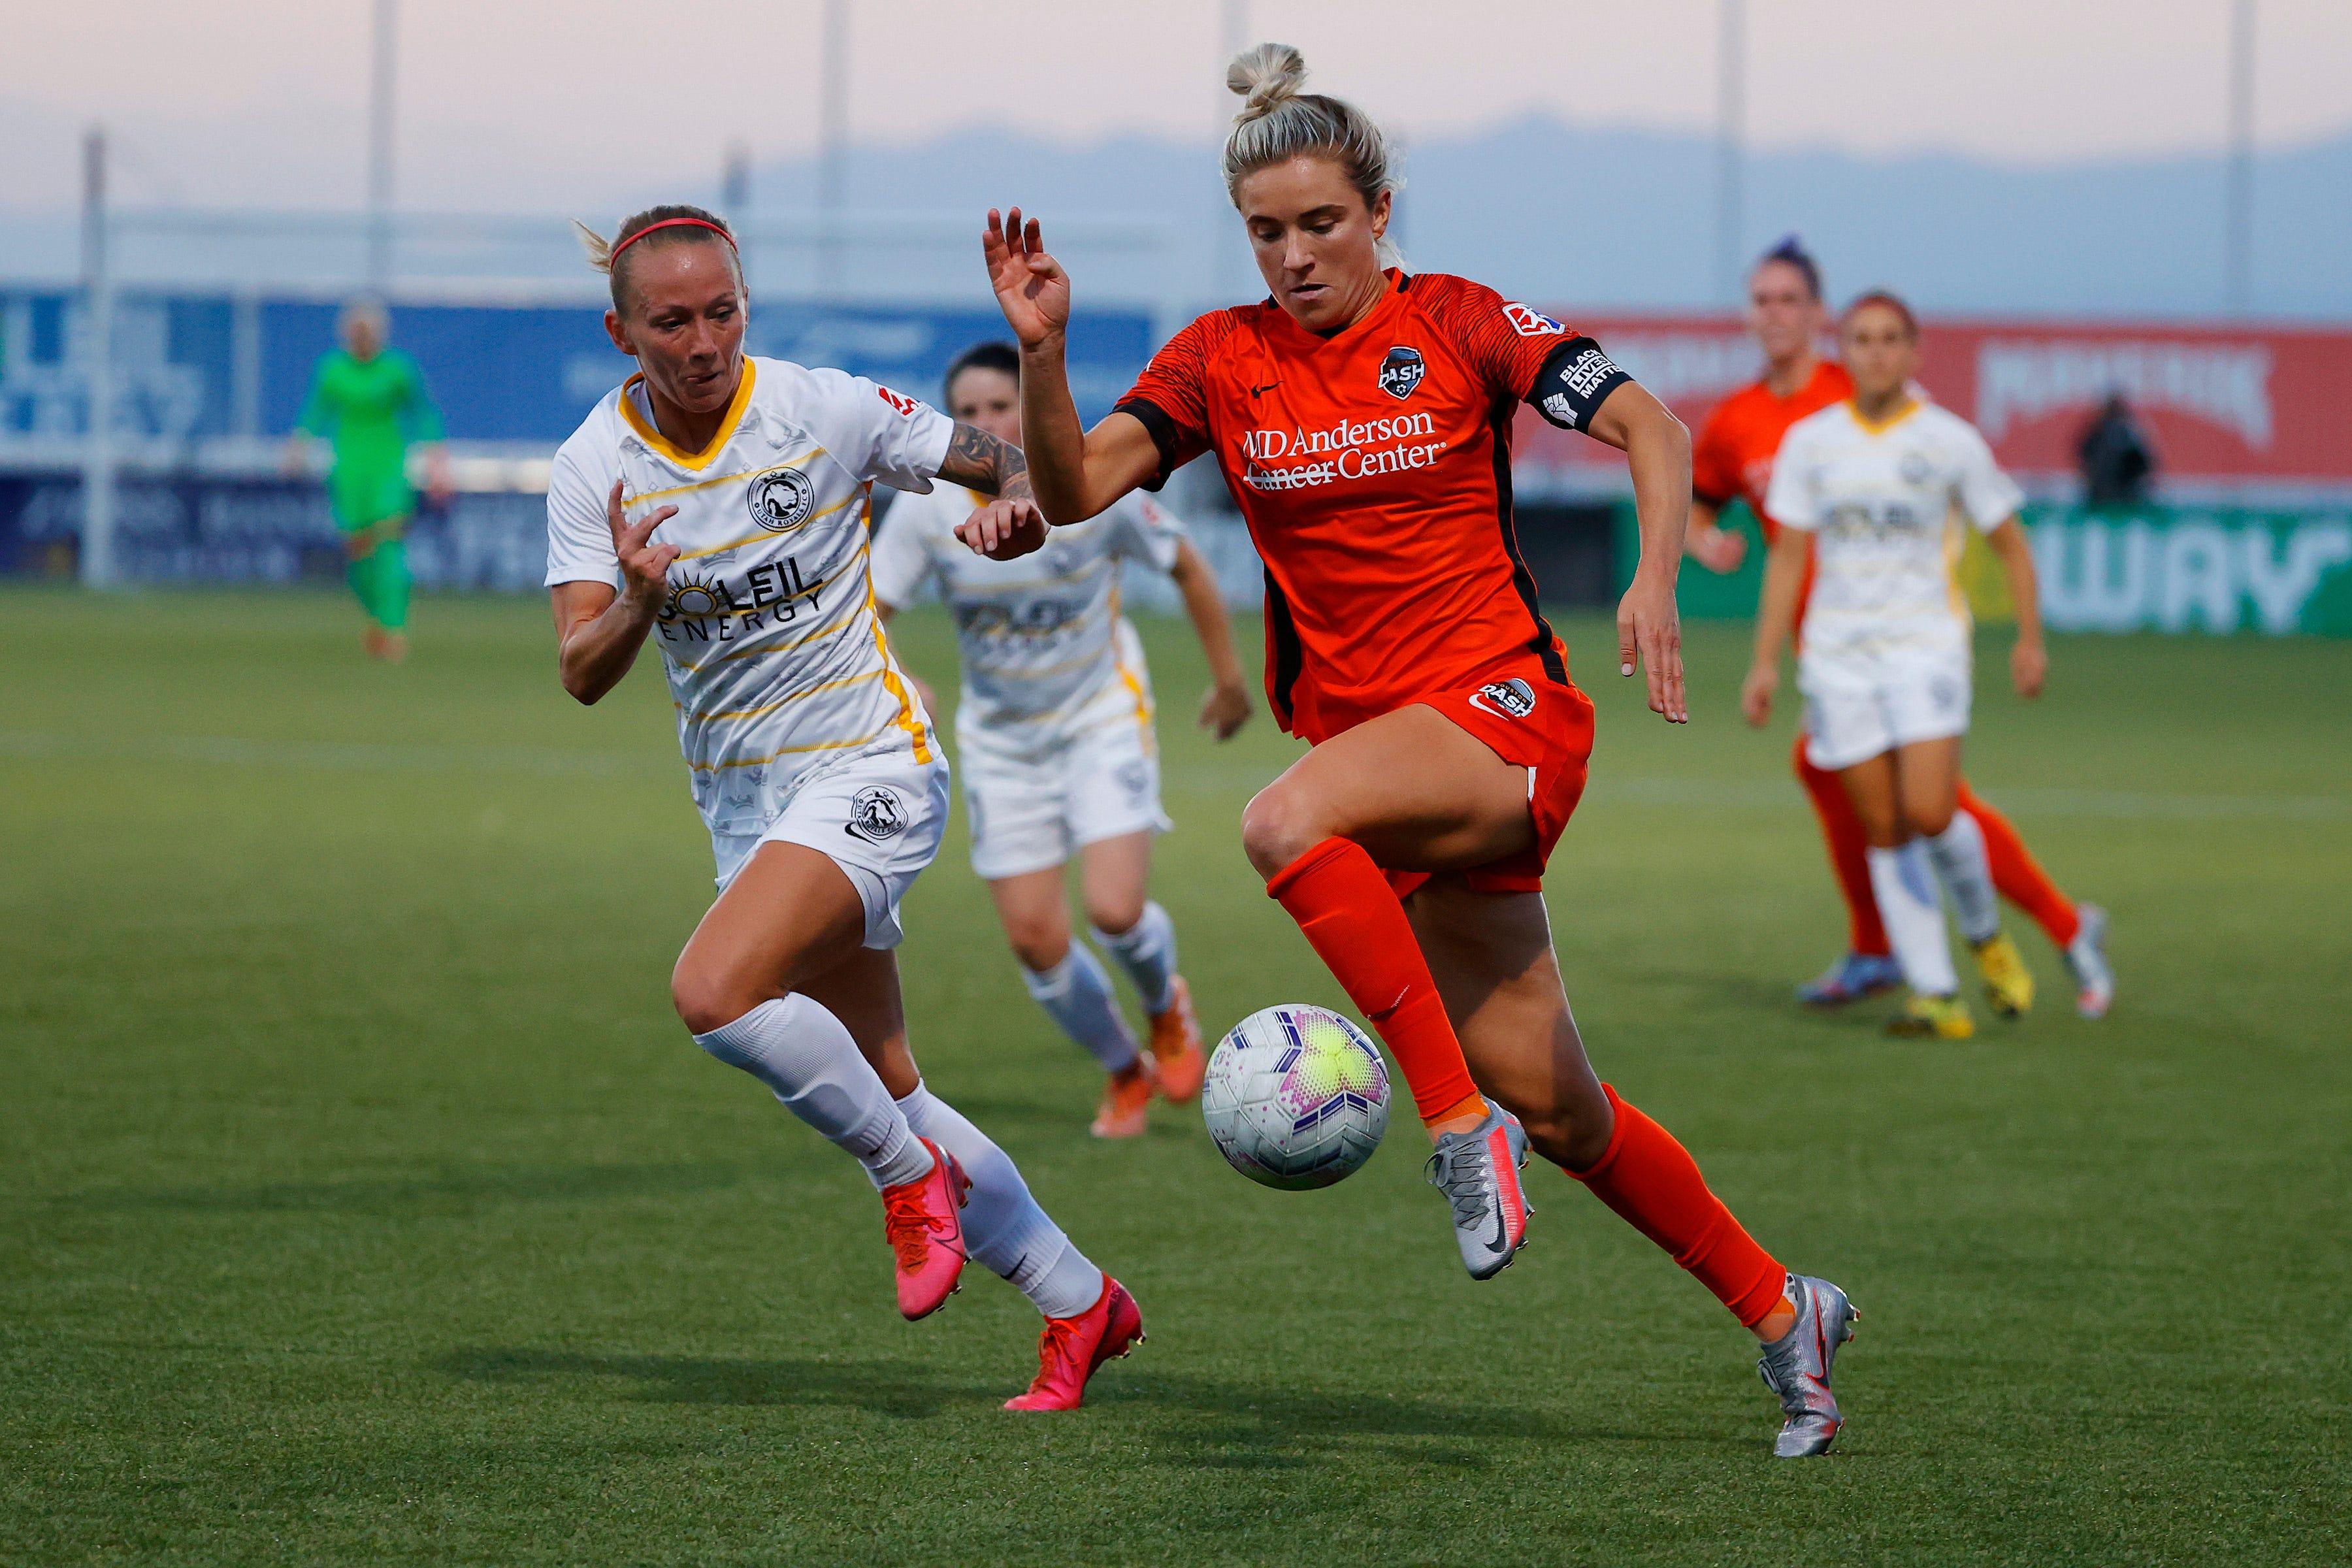 Mewis sisters of Hanson enjoyed banner 2020 soccer seasons